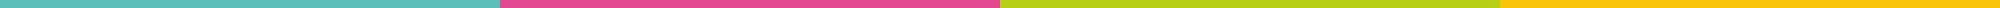 altura-colour-bar-sections